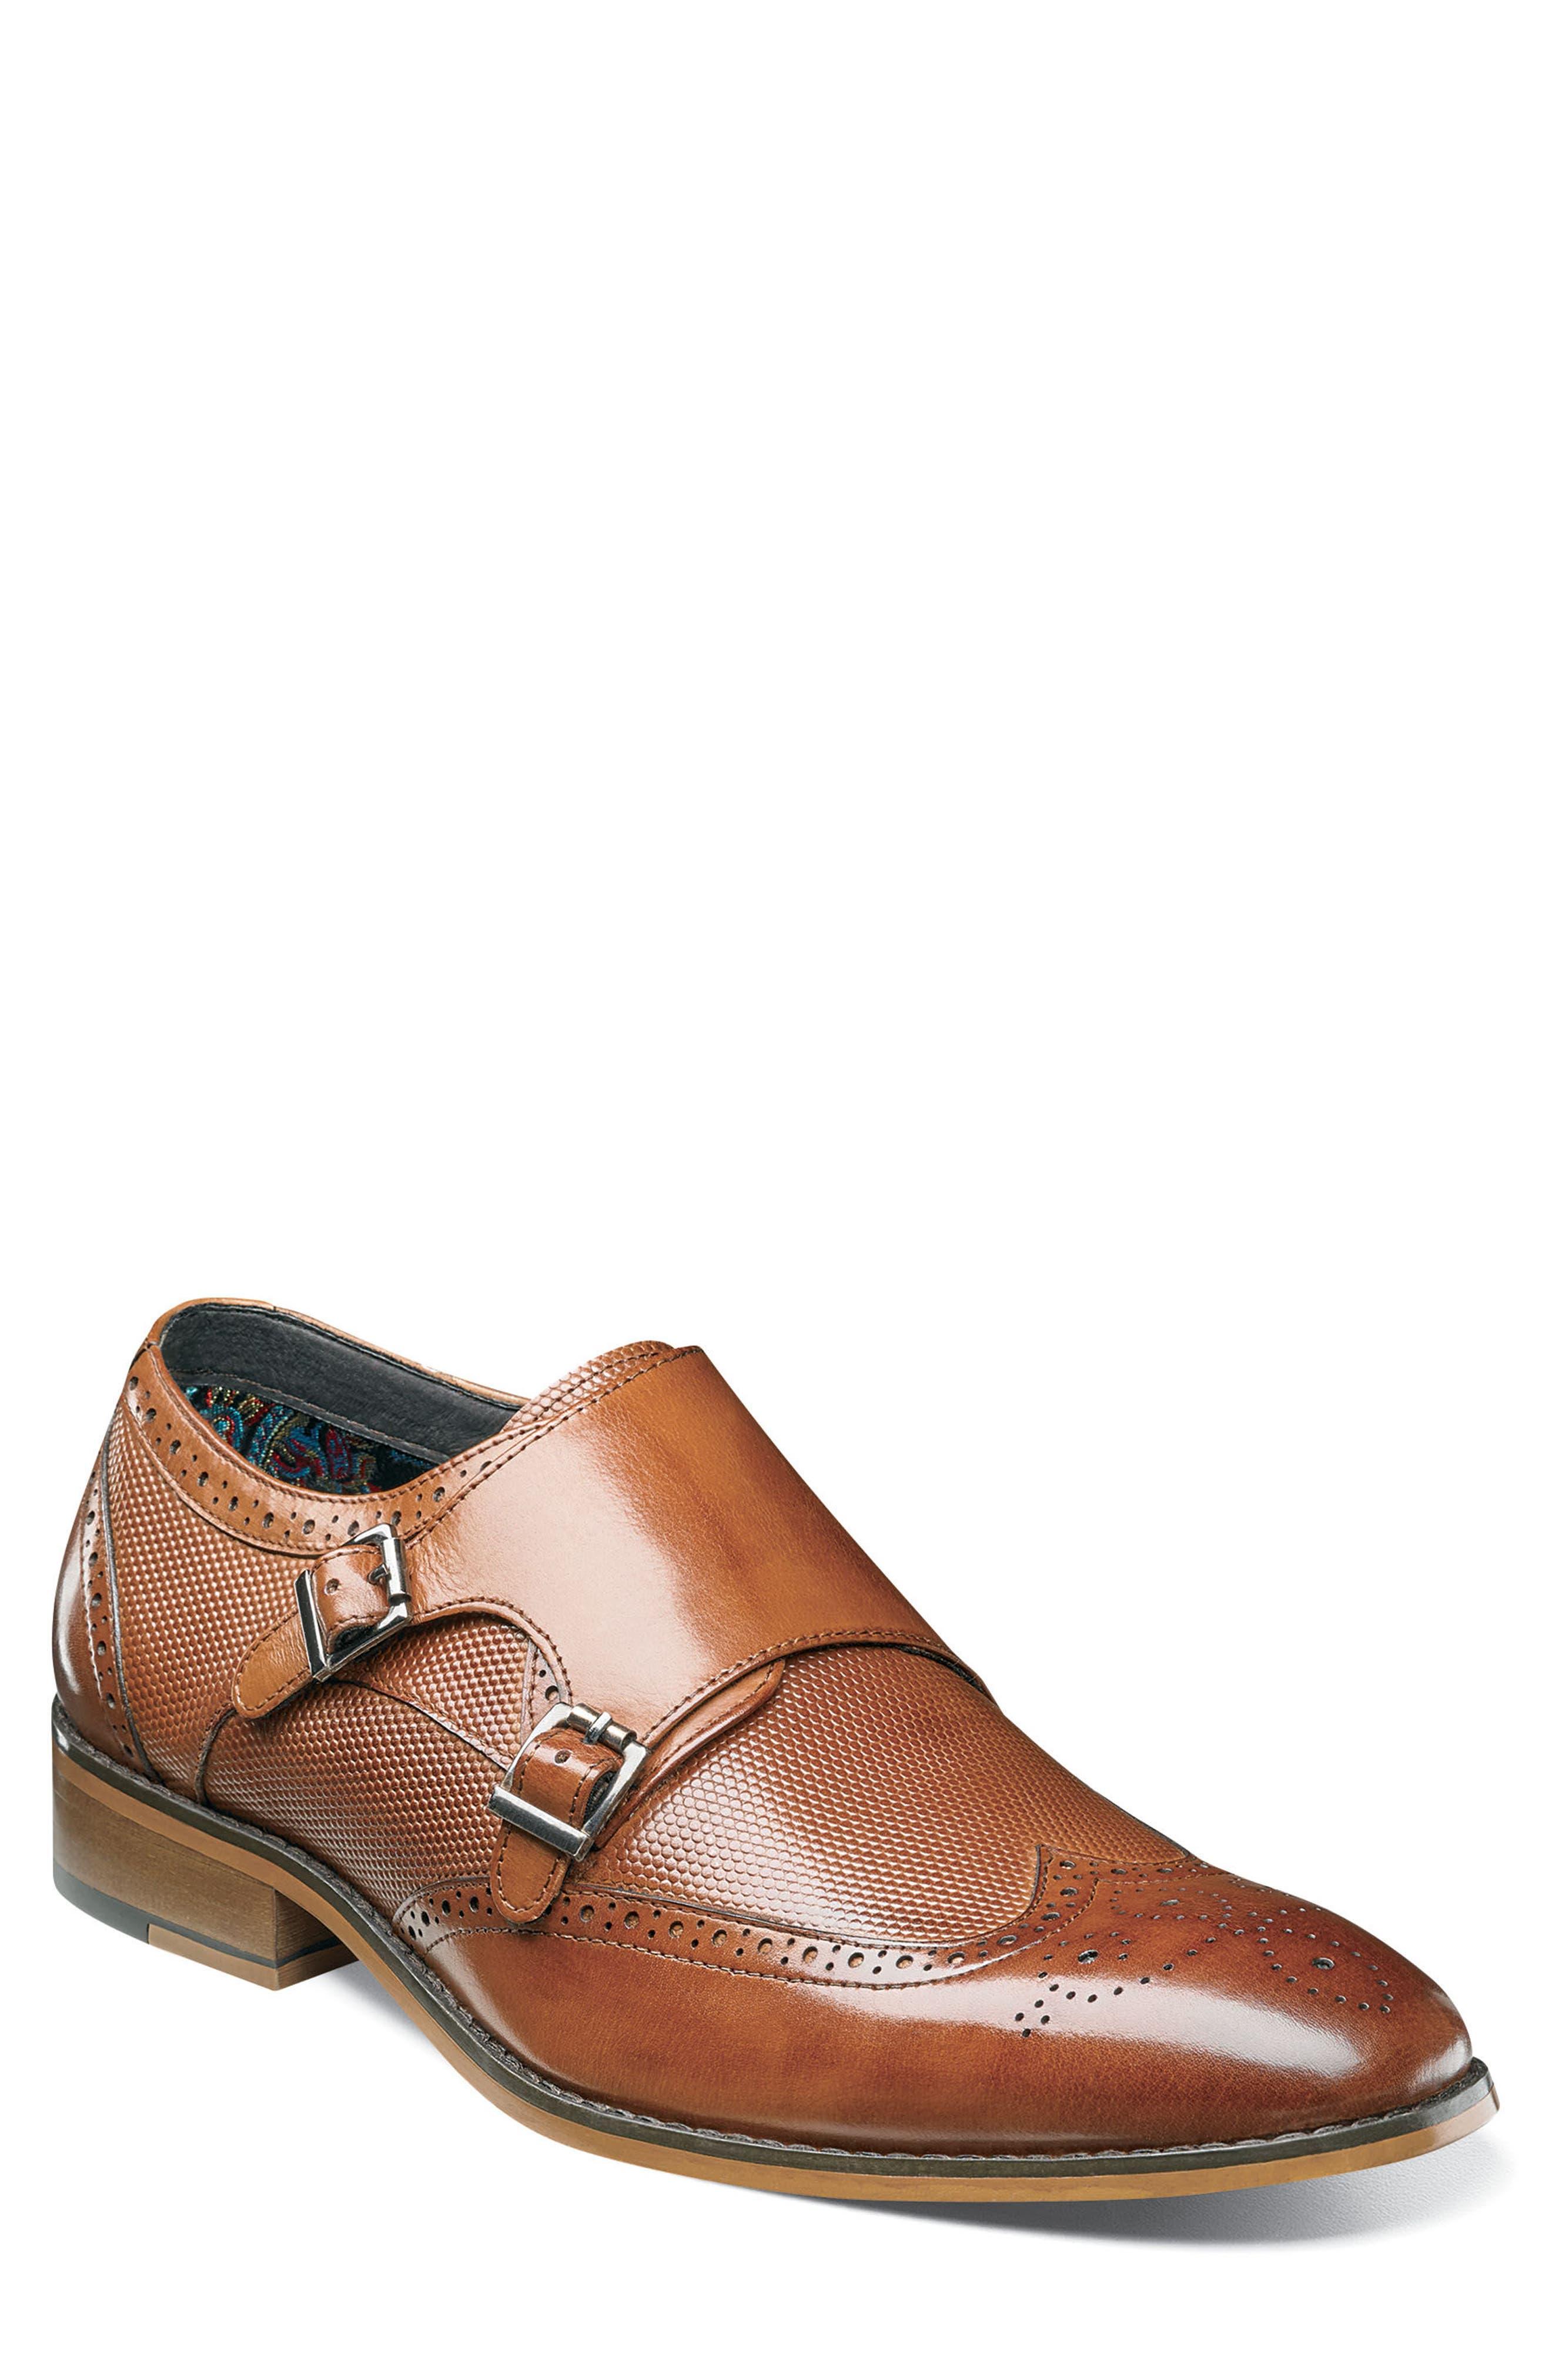 Lavine Wingtip Monk Shoe,                             Main thumbnail 1, color,                             SADDLE TAN LEATHER